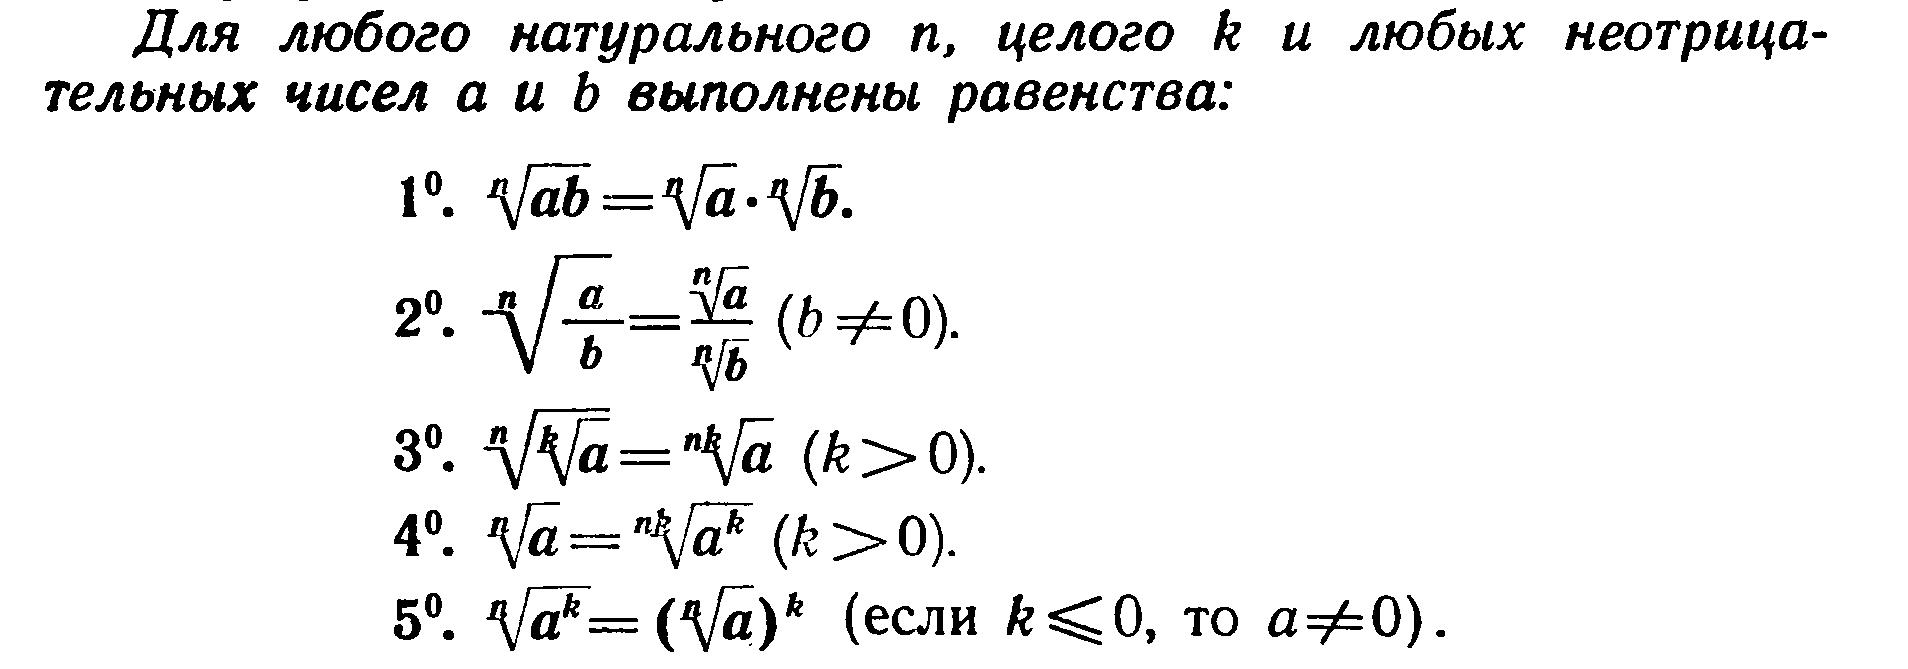 корней n-й шпаргалка свойства степени